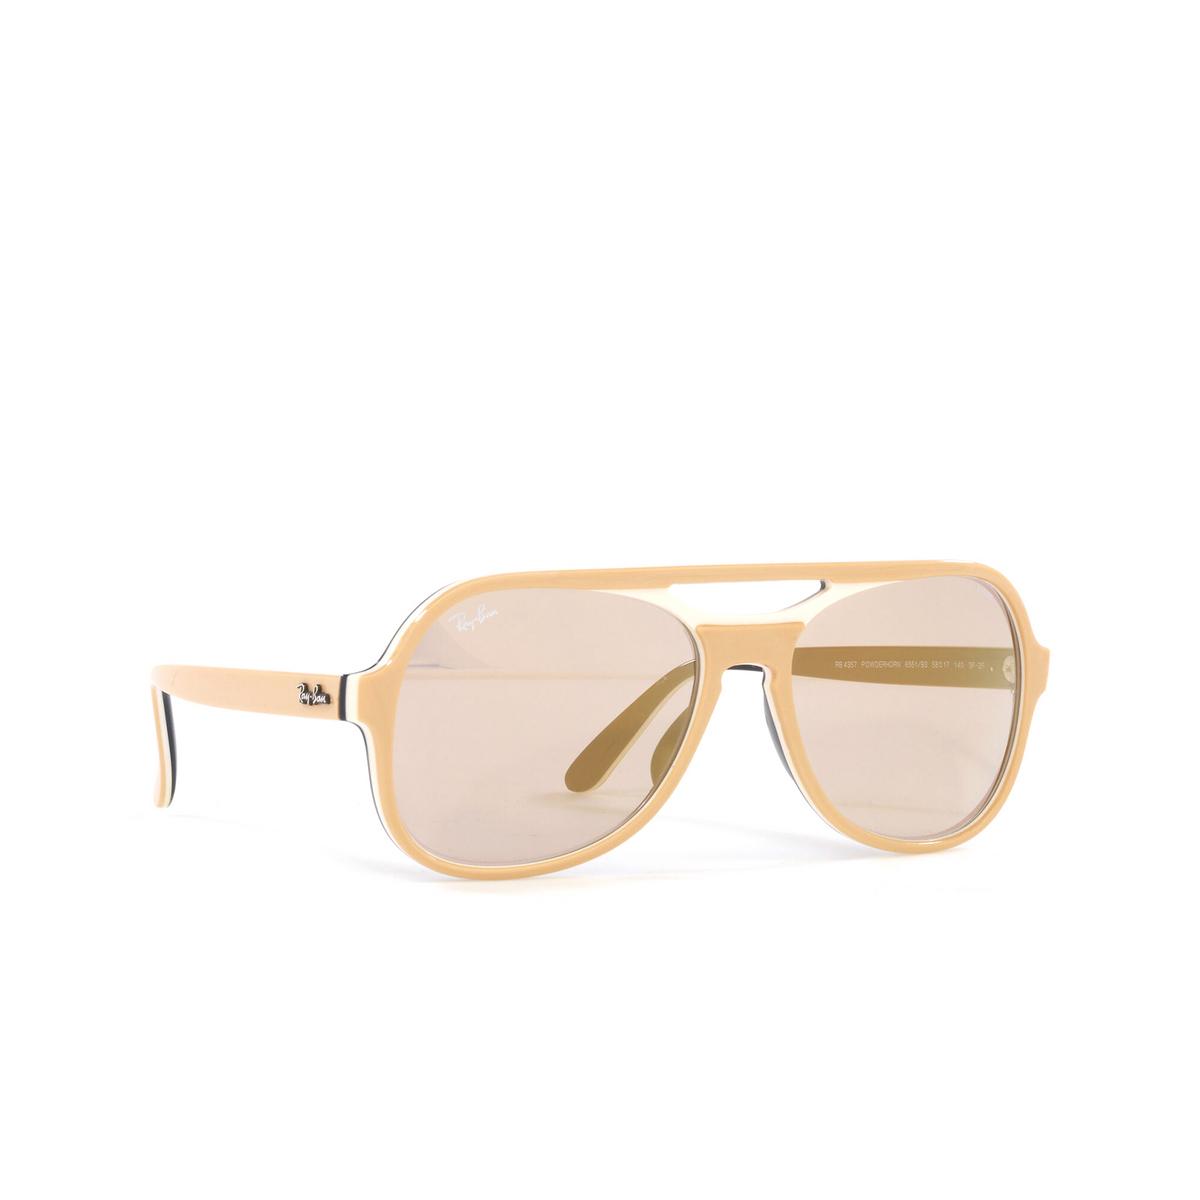 Ray-Ban® Aviator Sunglasses: Powderhorn RB4357 color Light Brown Creamy Blue 6551B3 - three-quarters view.